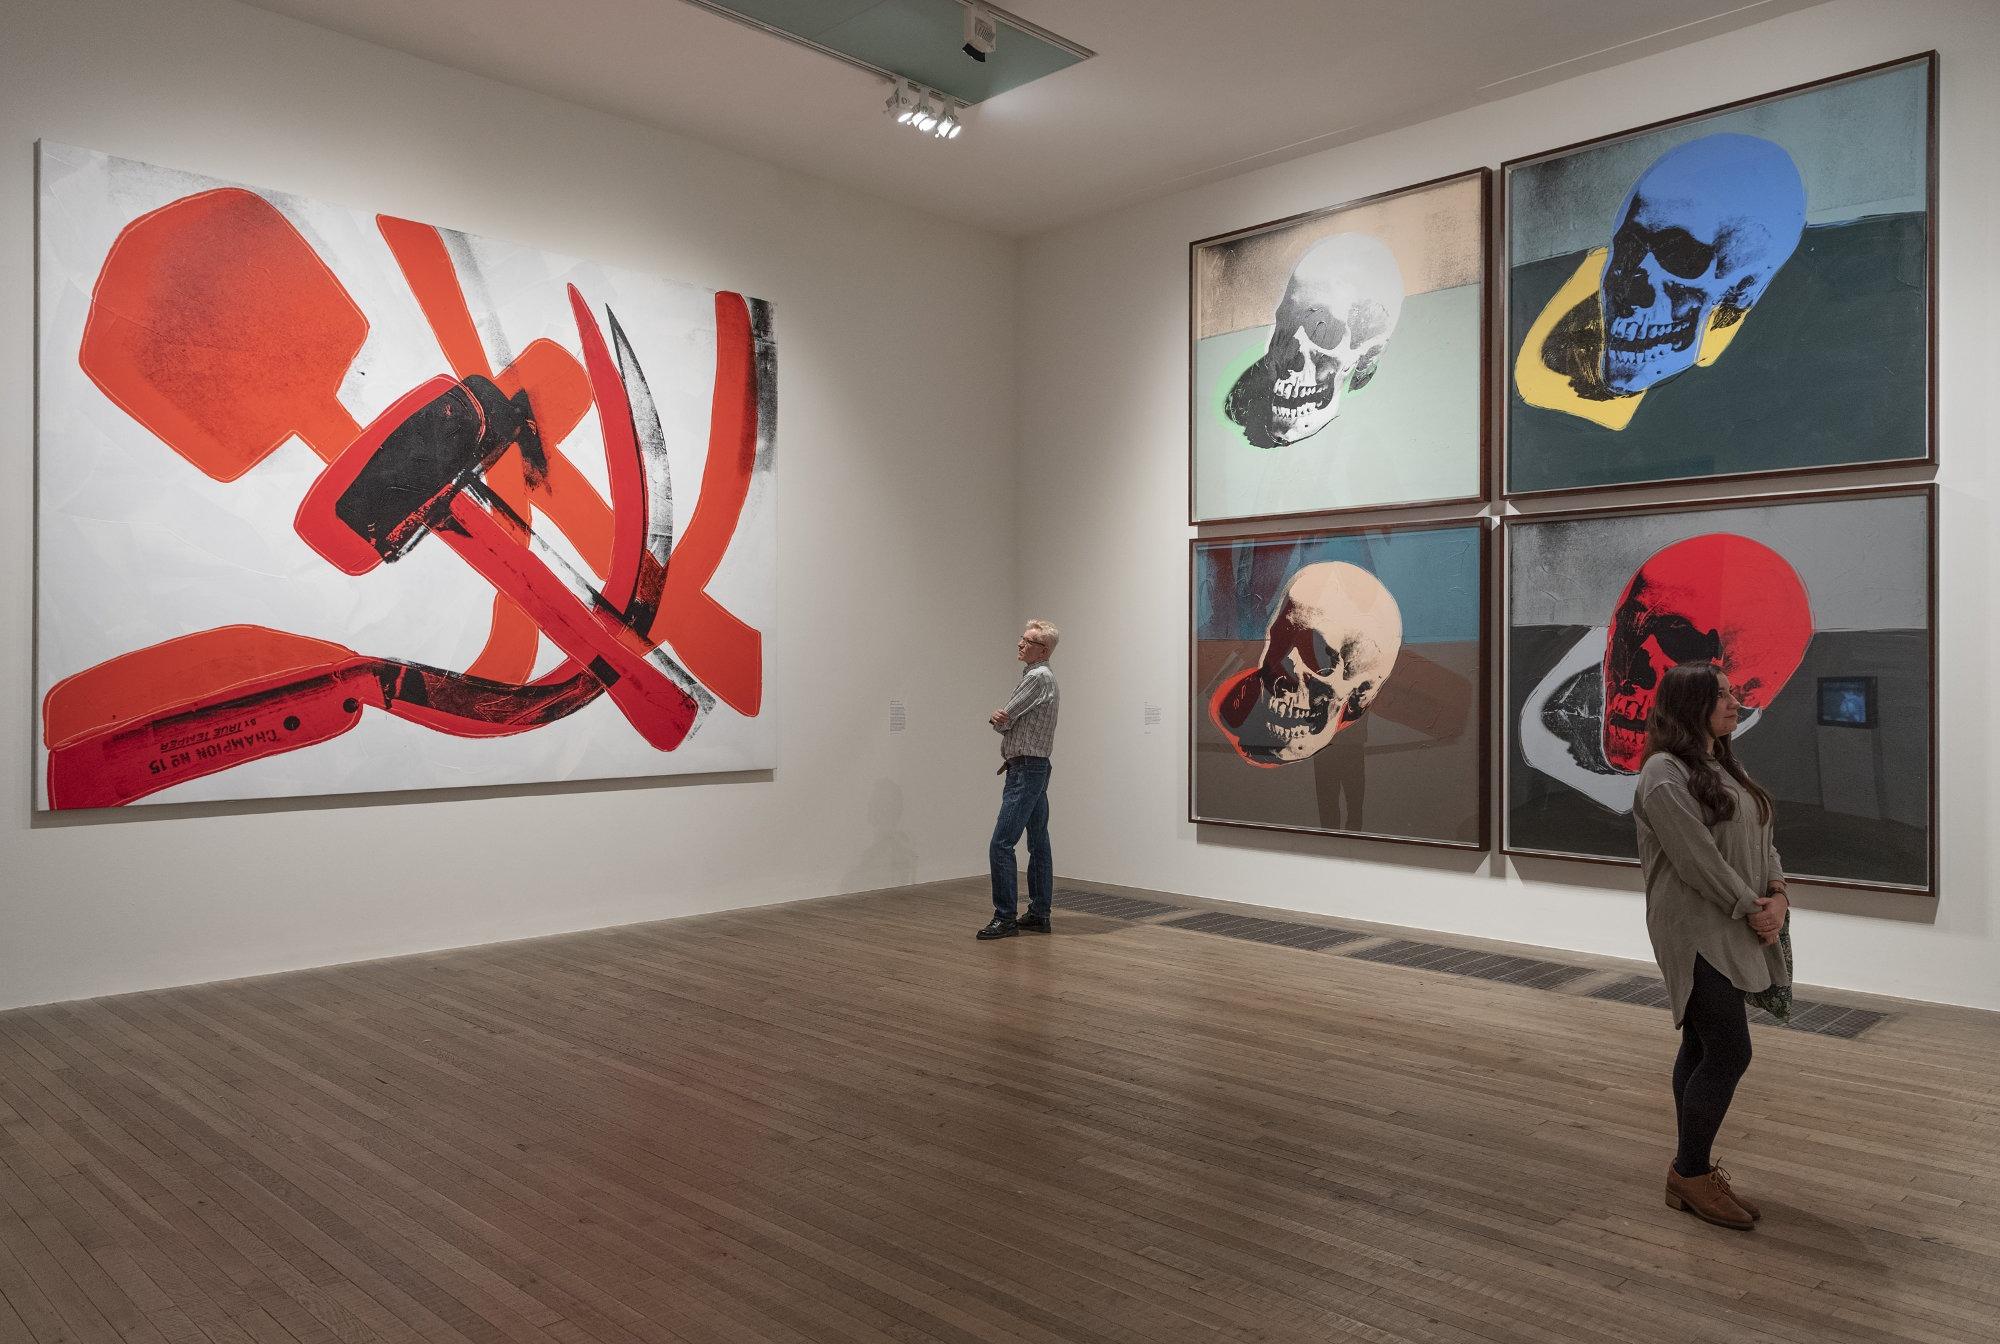 Andy Warhol At Tate Modern London Artmap Com